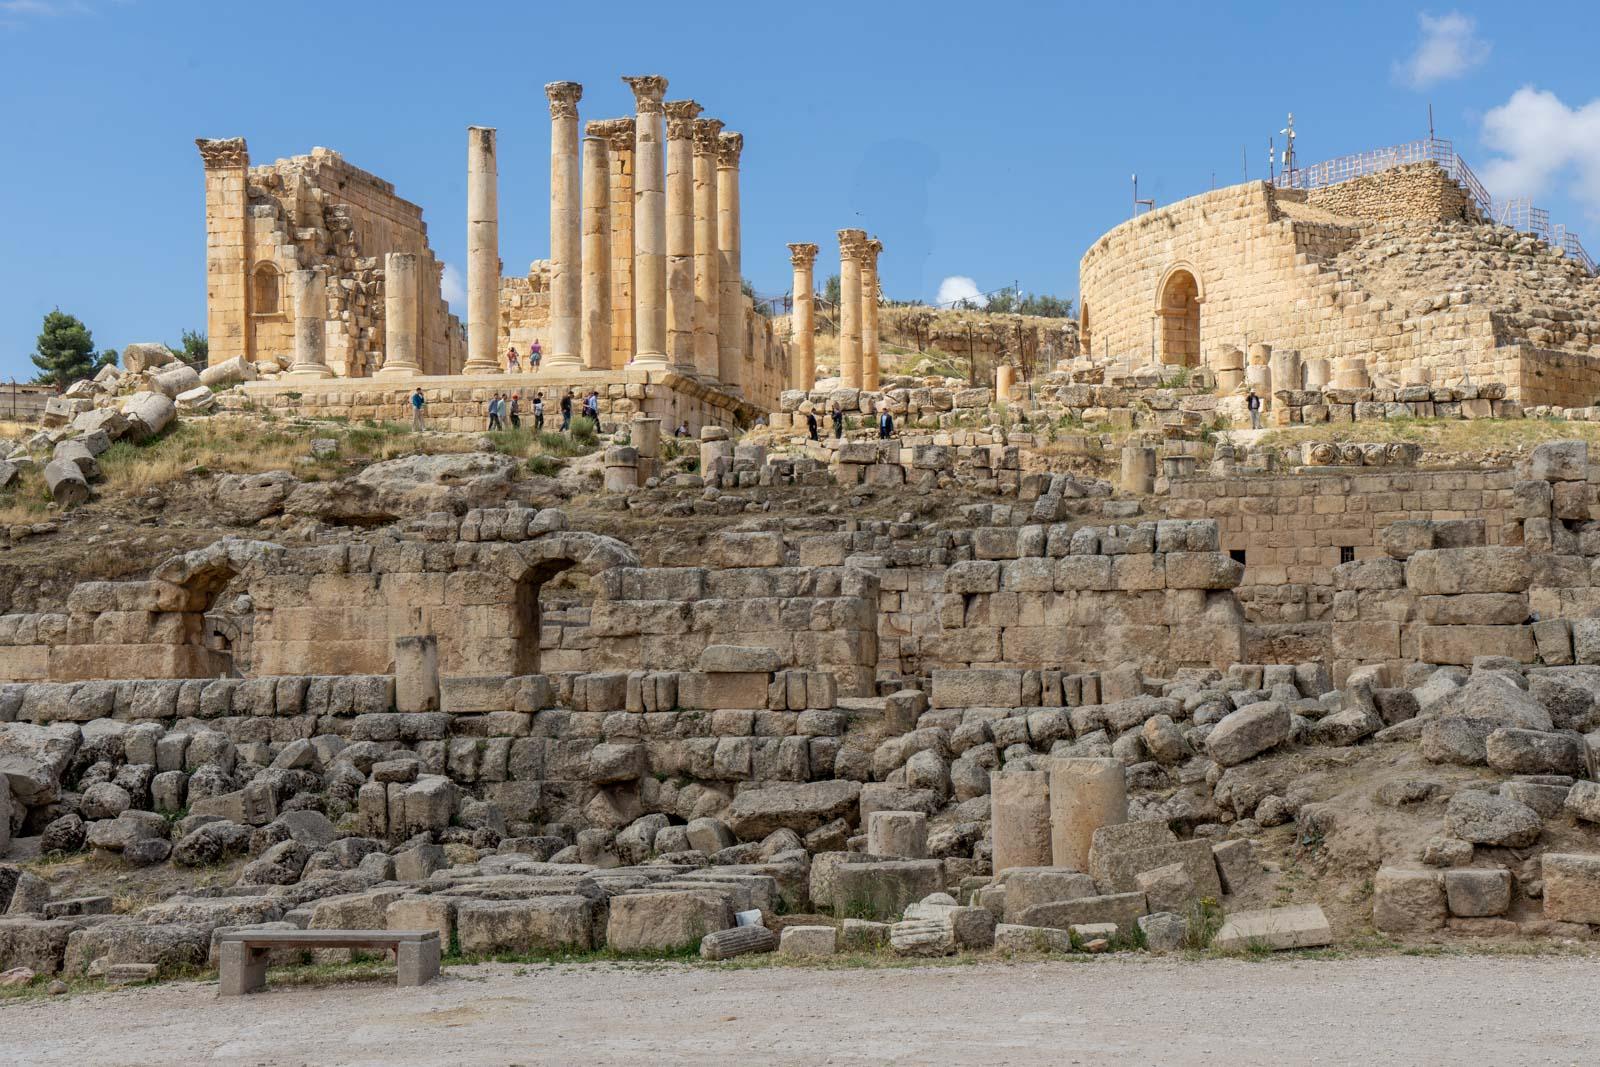 Temple of Zeus, Jerash, Jordan